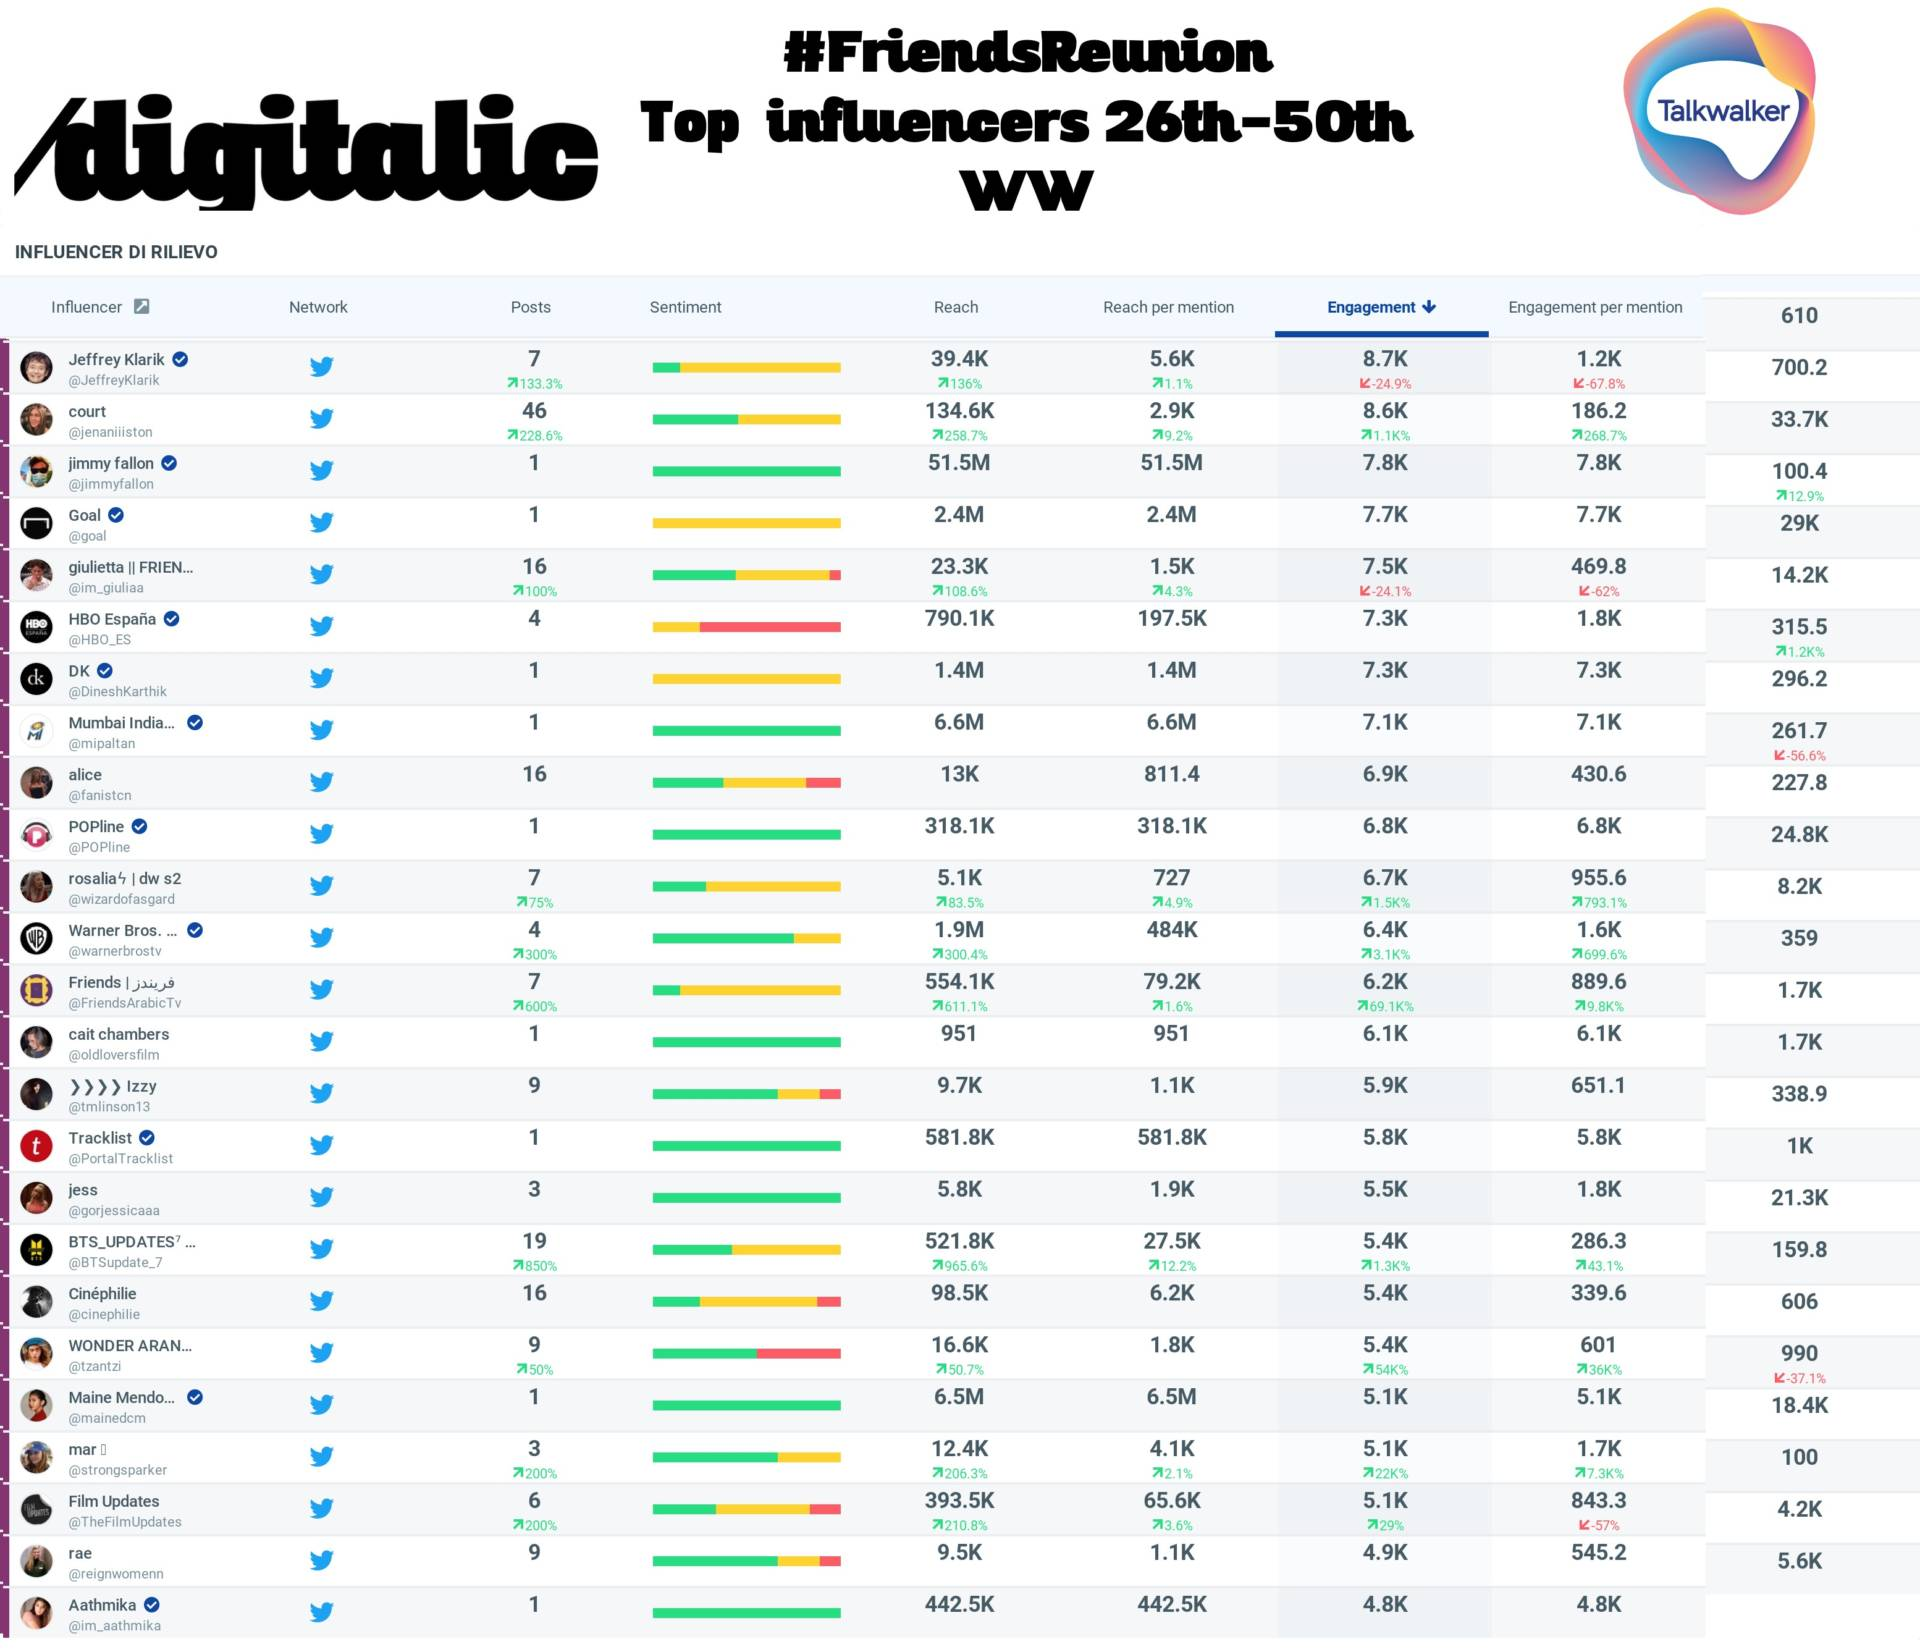 Friends Reunion top 26-50 Influencers WW